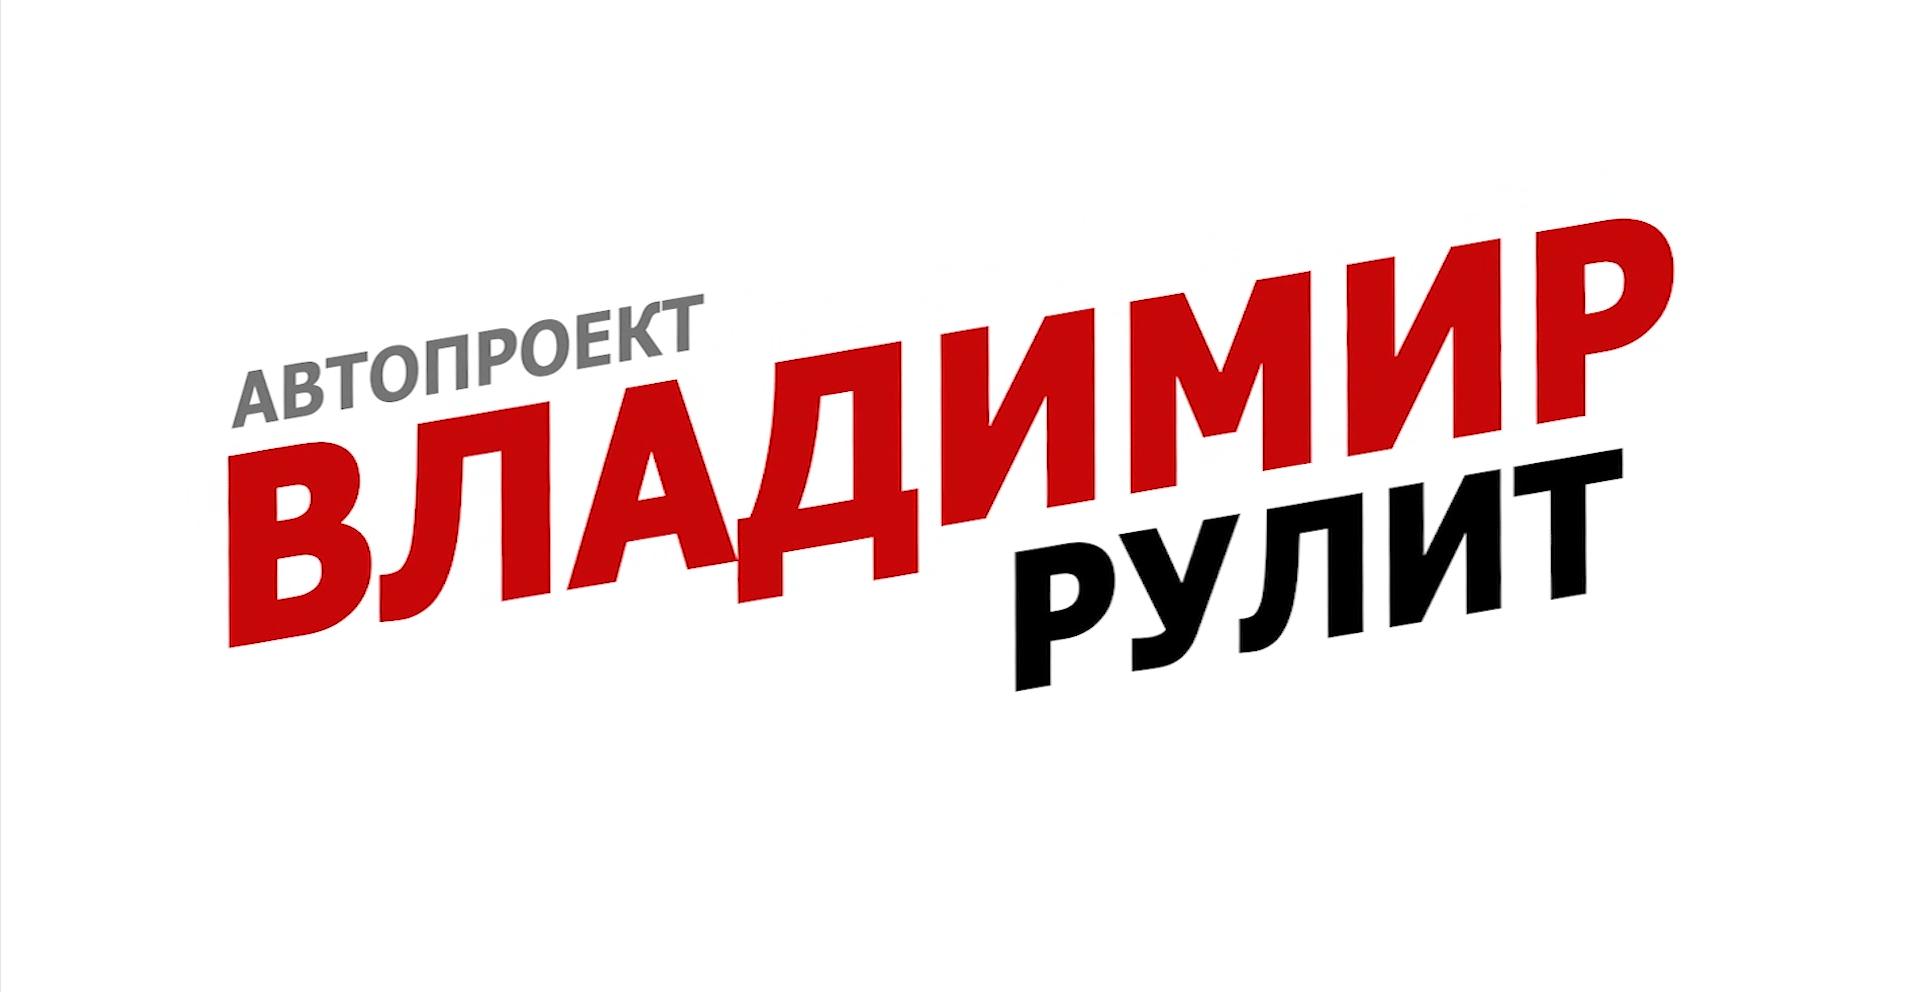 vladimir rulit_obl